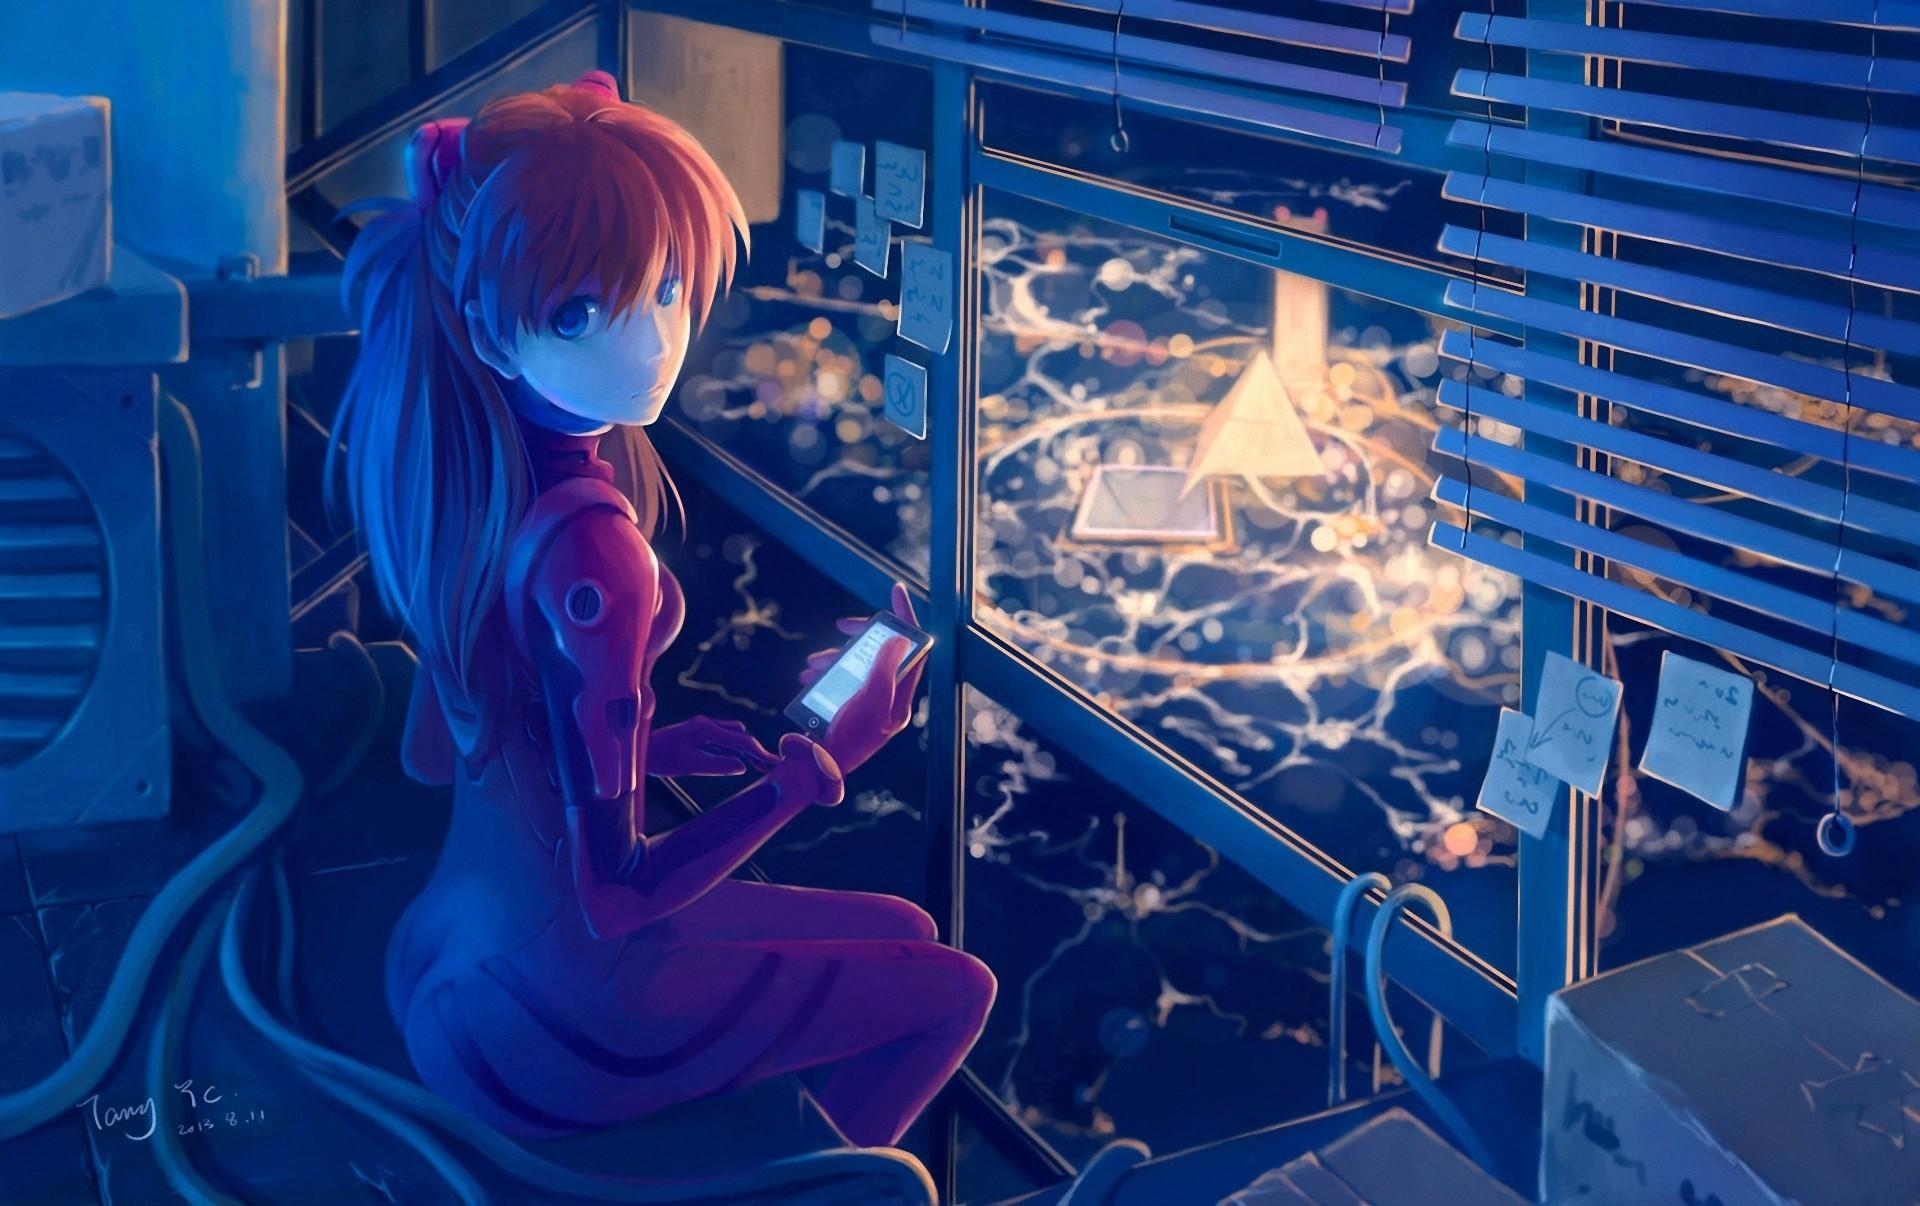 Anime 1920x1206 drawing Asuka Langley Soryu Neon Genesis Evangelion anime tyc001x